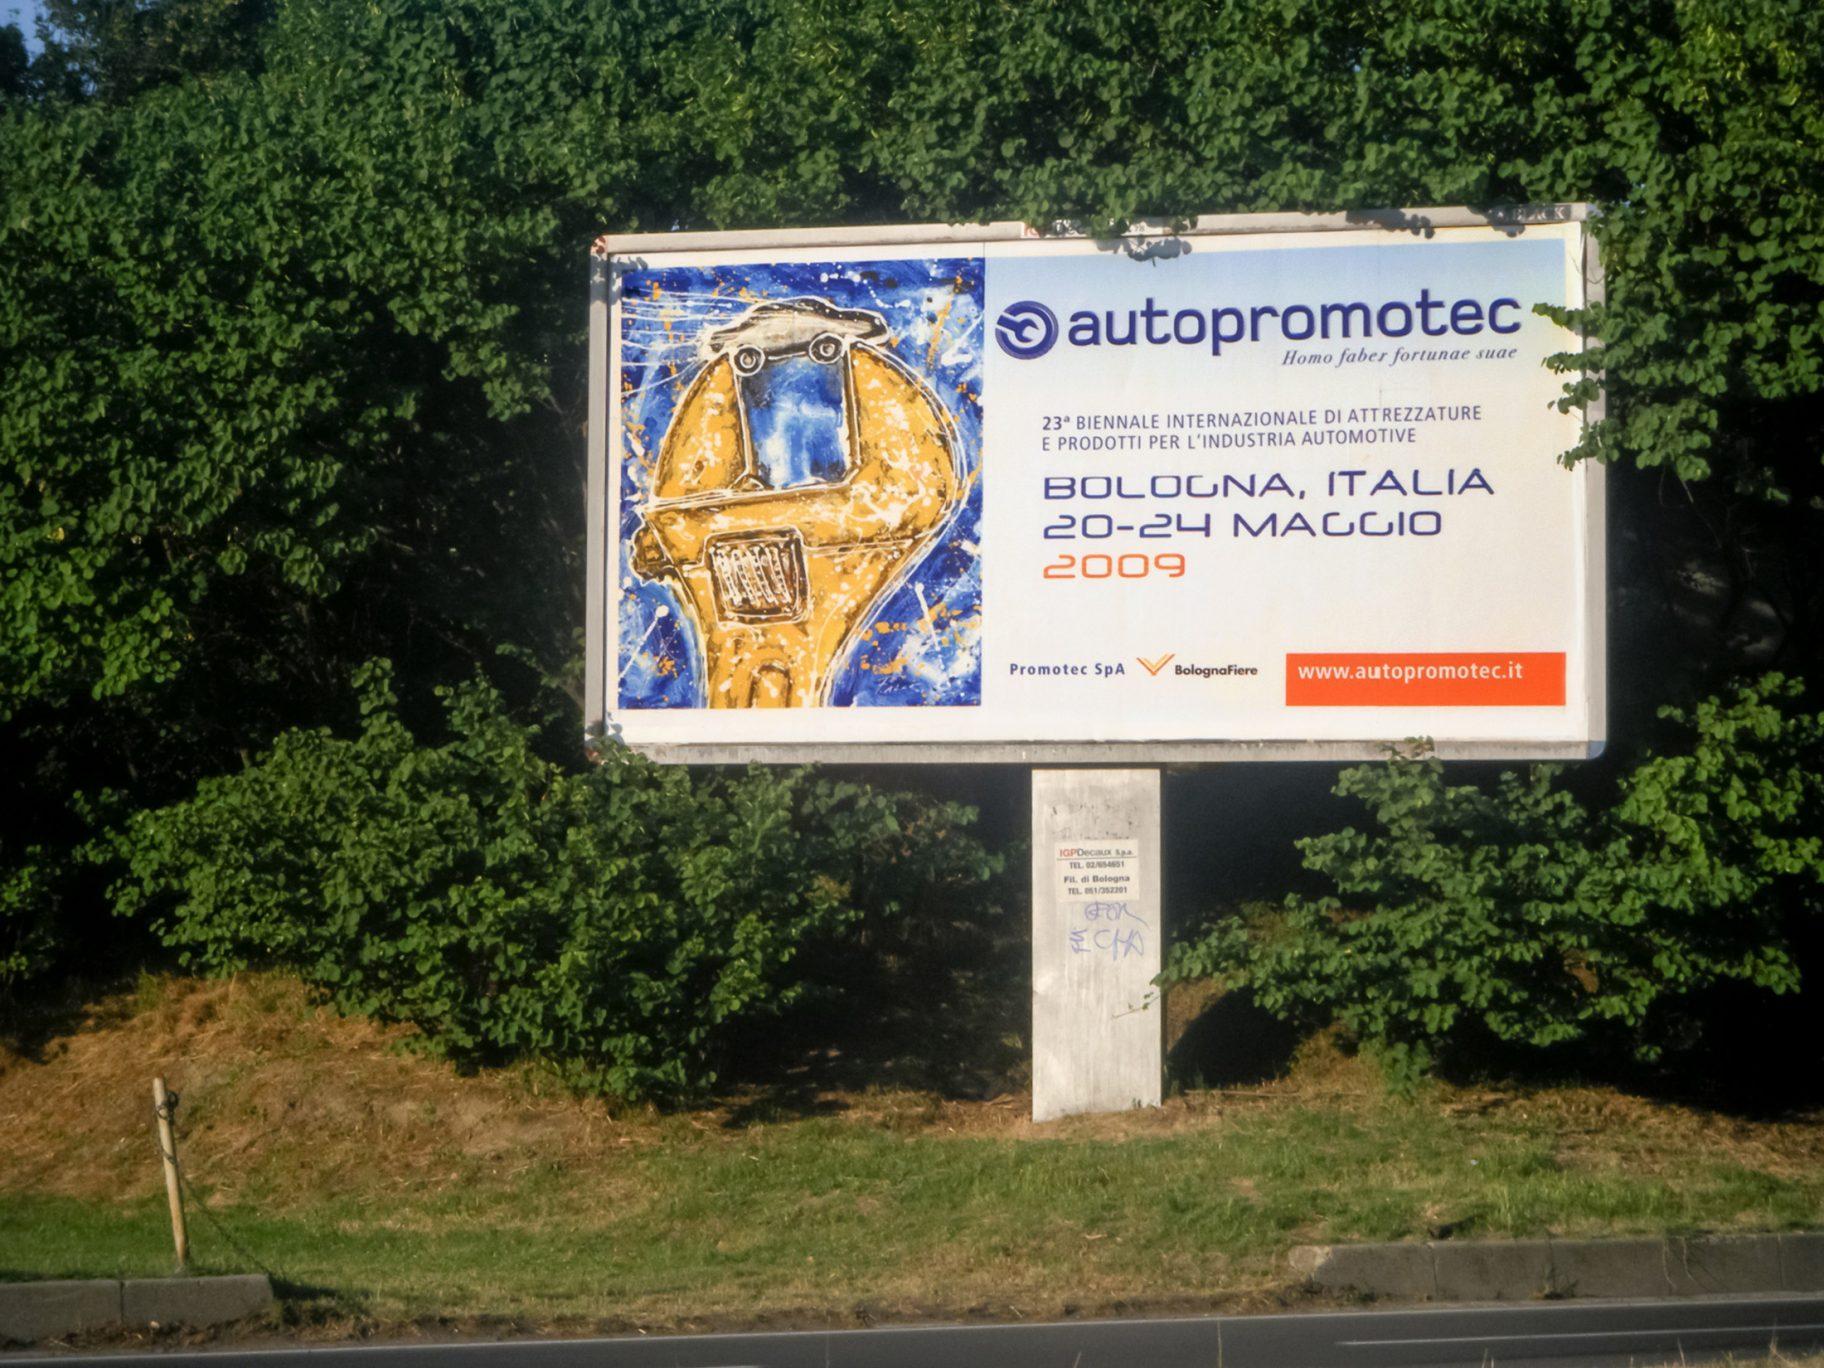 Autopromotec-fiera-2009-cartello